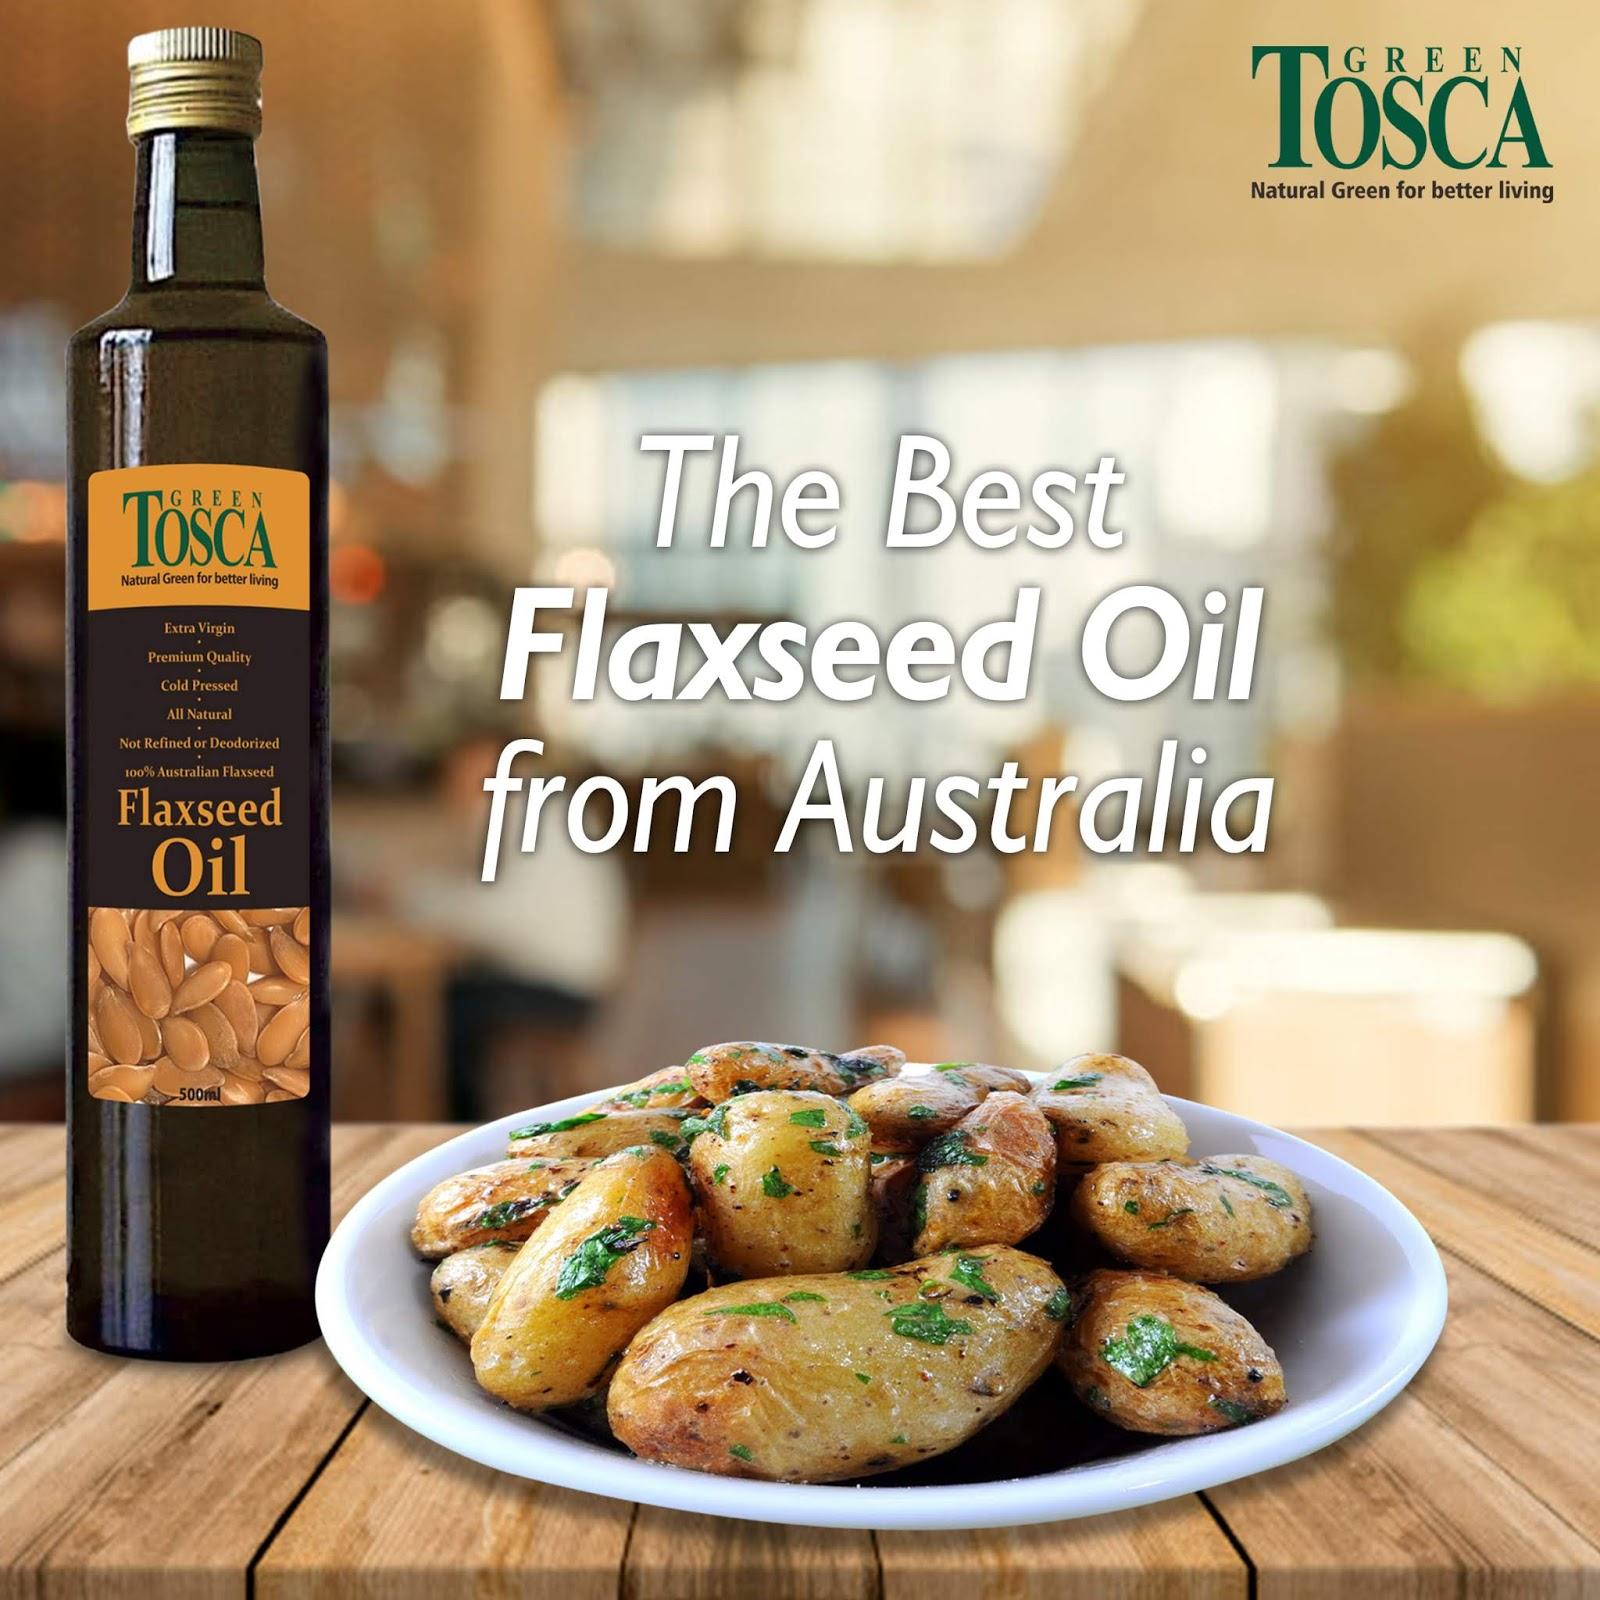 Flaxseed Oil Minyak Biji Rami Minyak Masak Paling Sehat